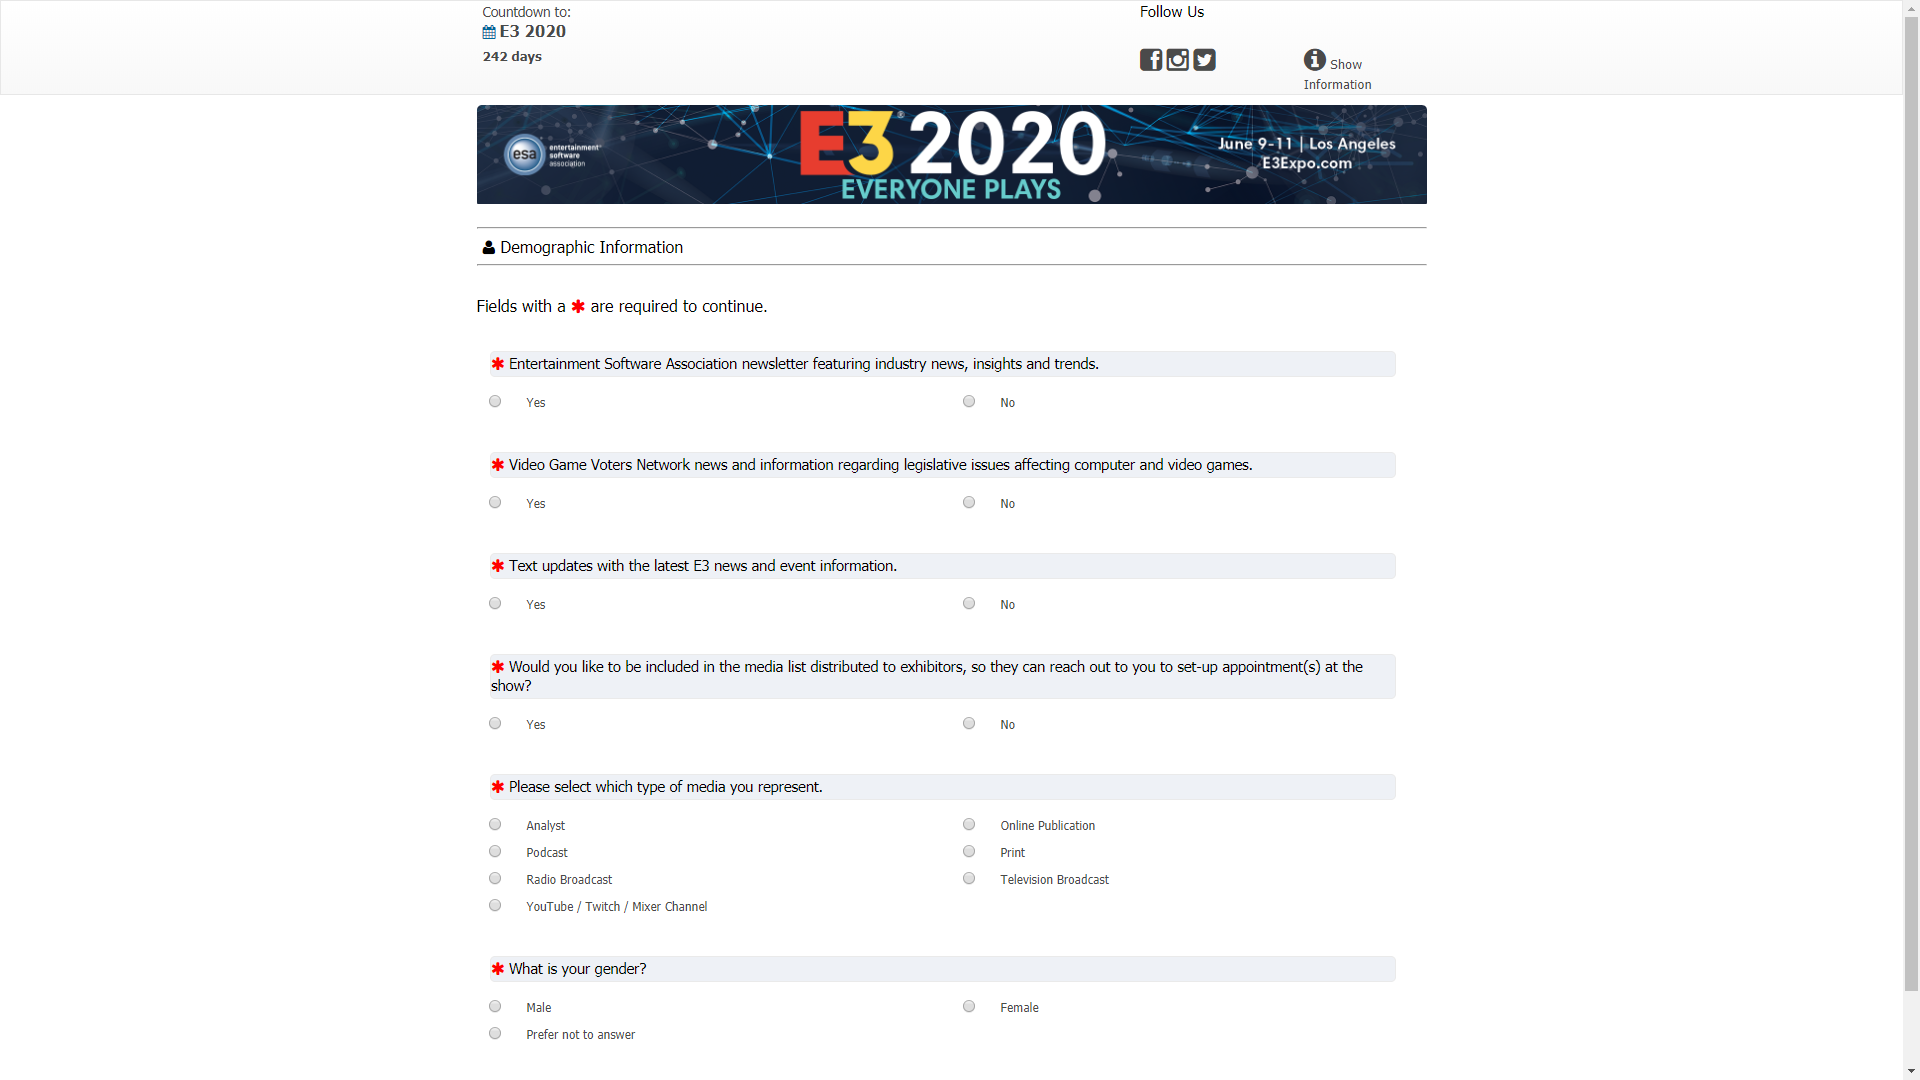 List Of E3 2020 Games.E3 2020 Information Passes 60 995 Media List Opt